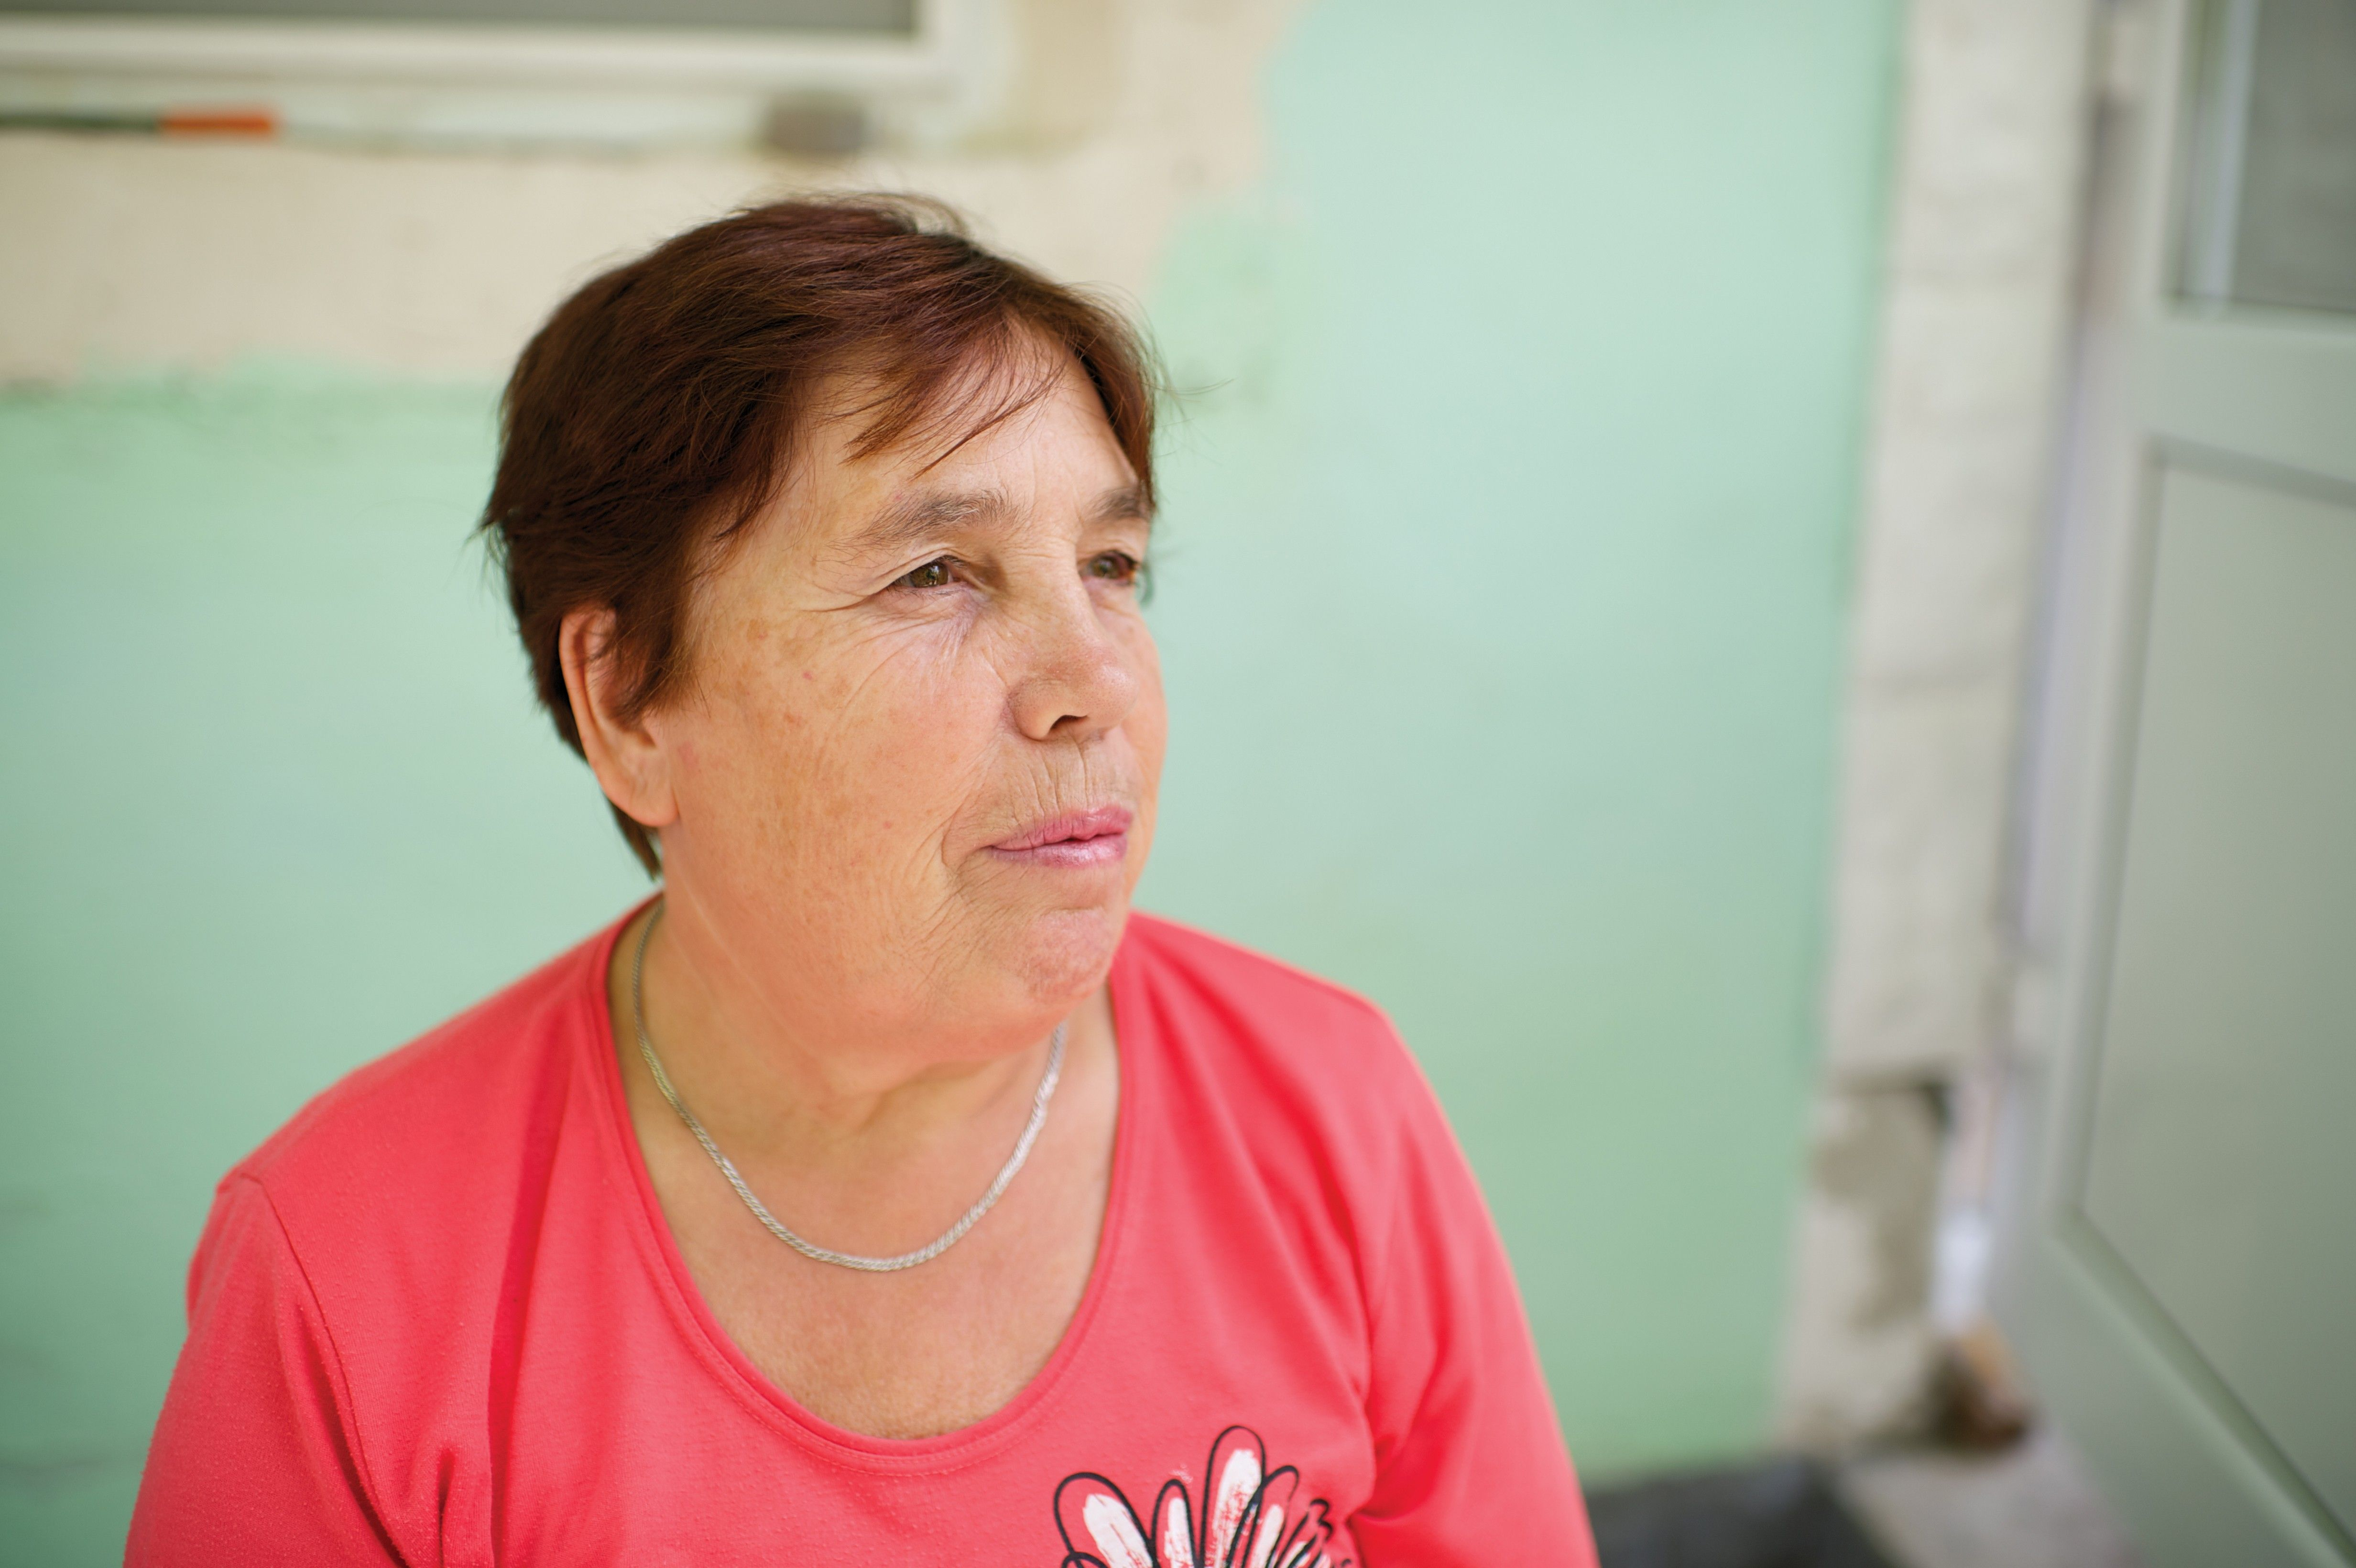 An informal portrait of a woman sitting outside in Romania.